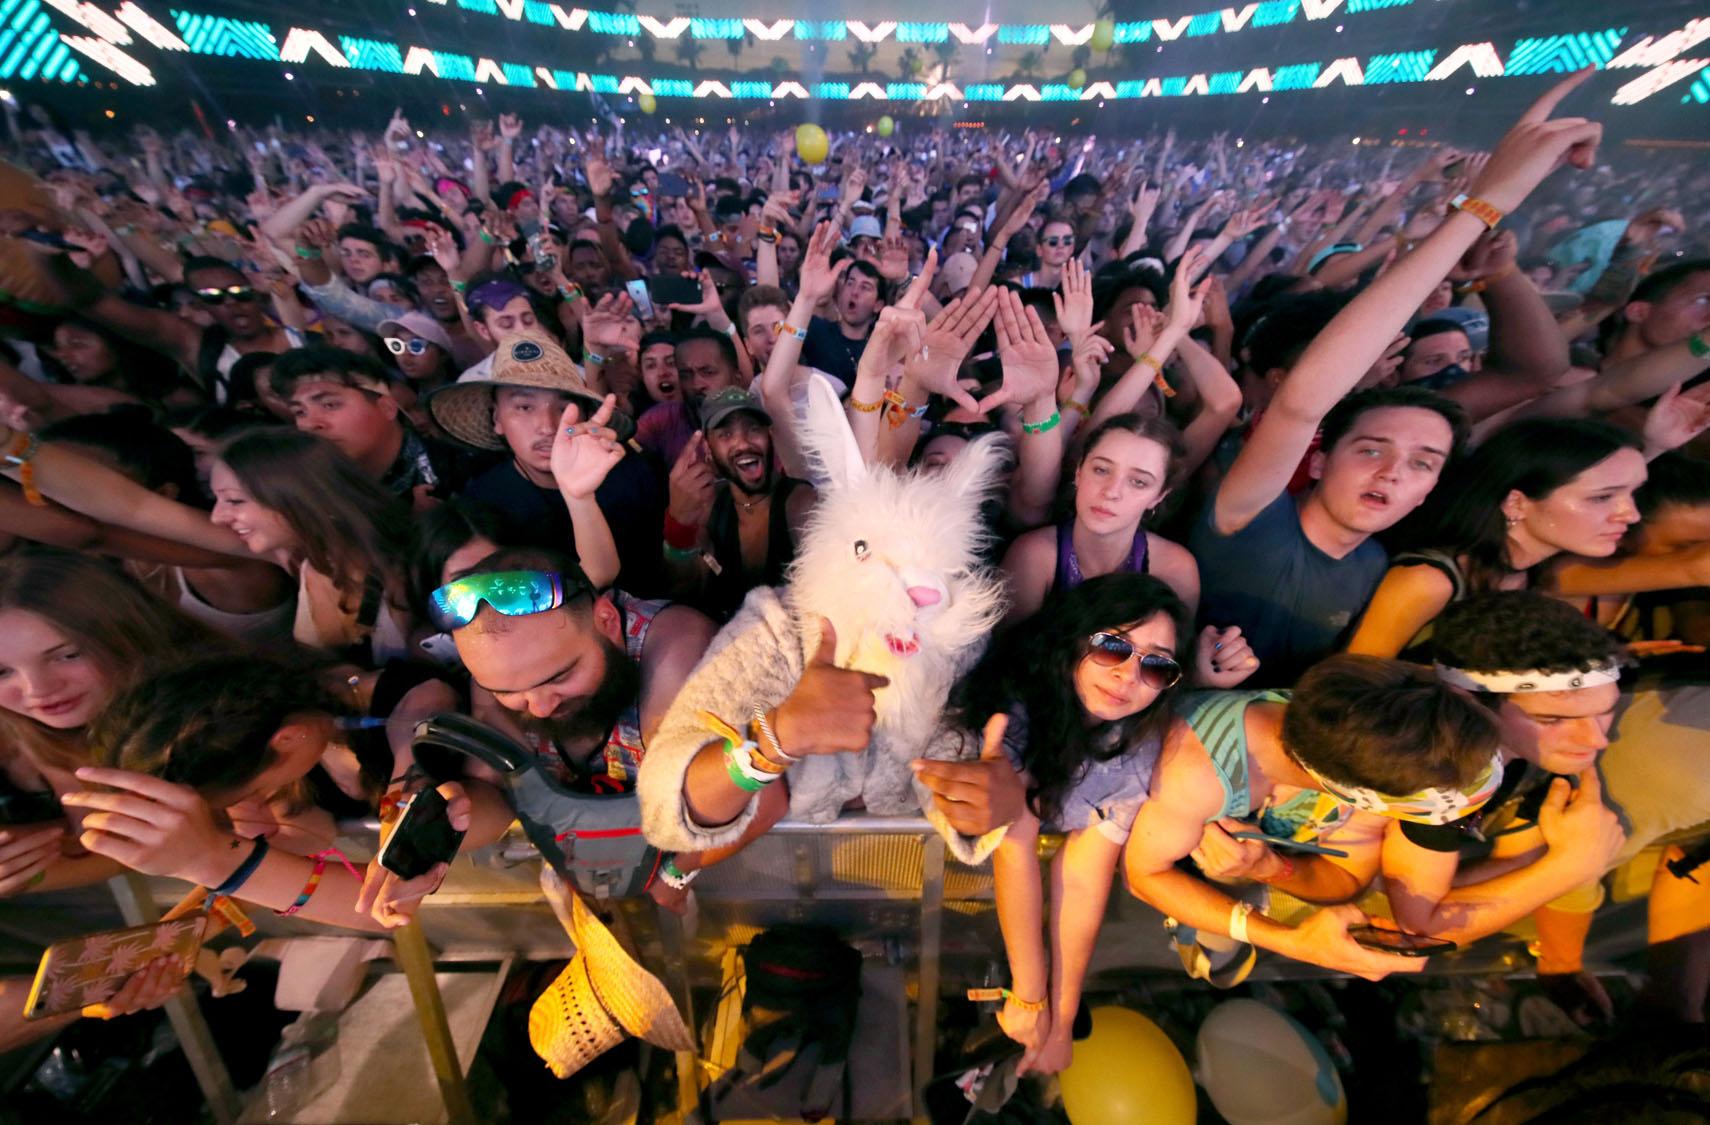 Coachella Valley Music and Arts Festival 2017